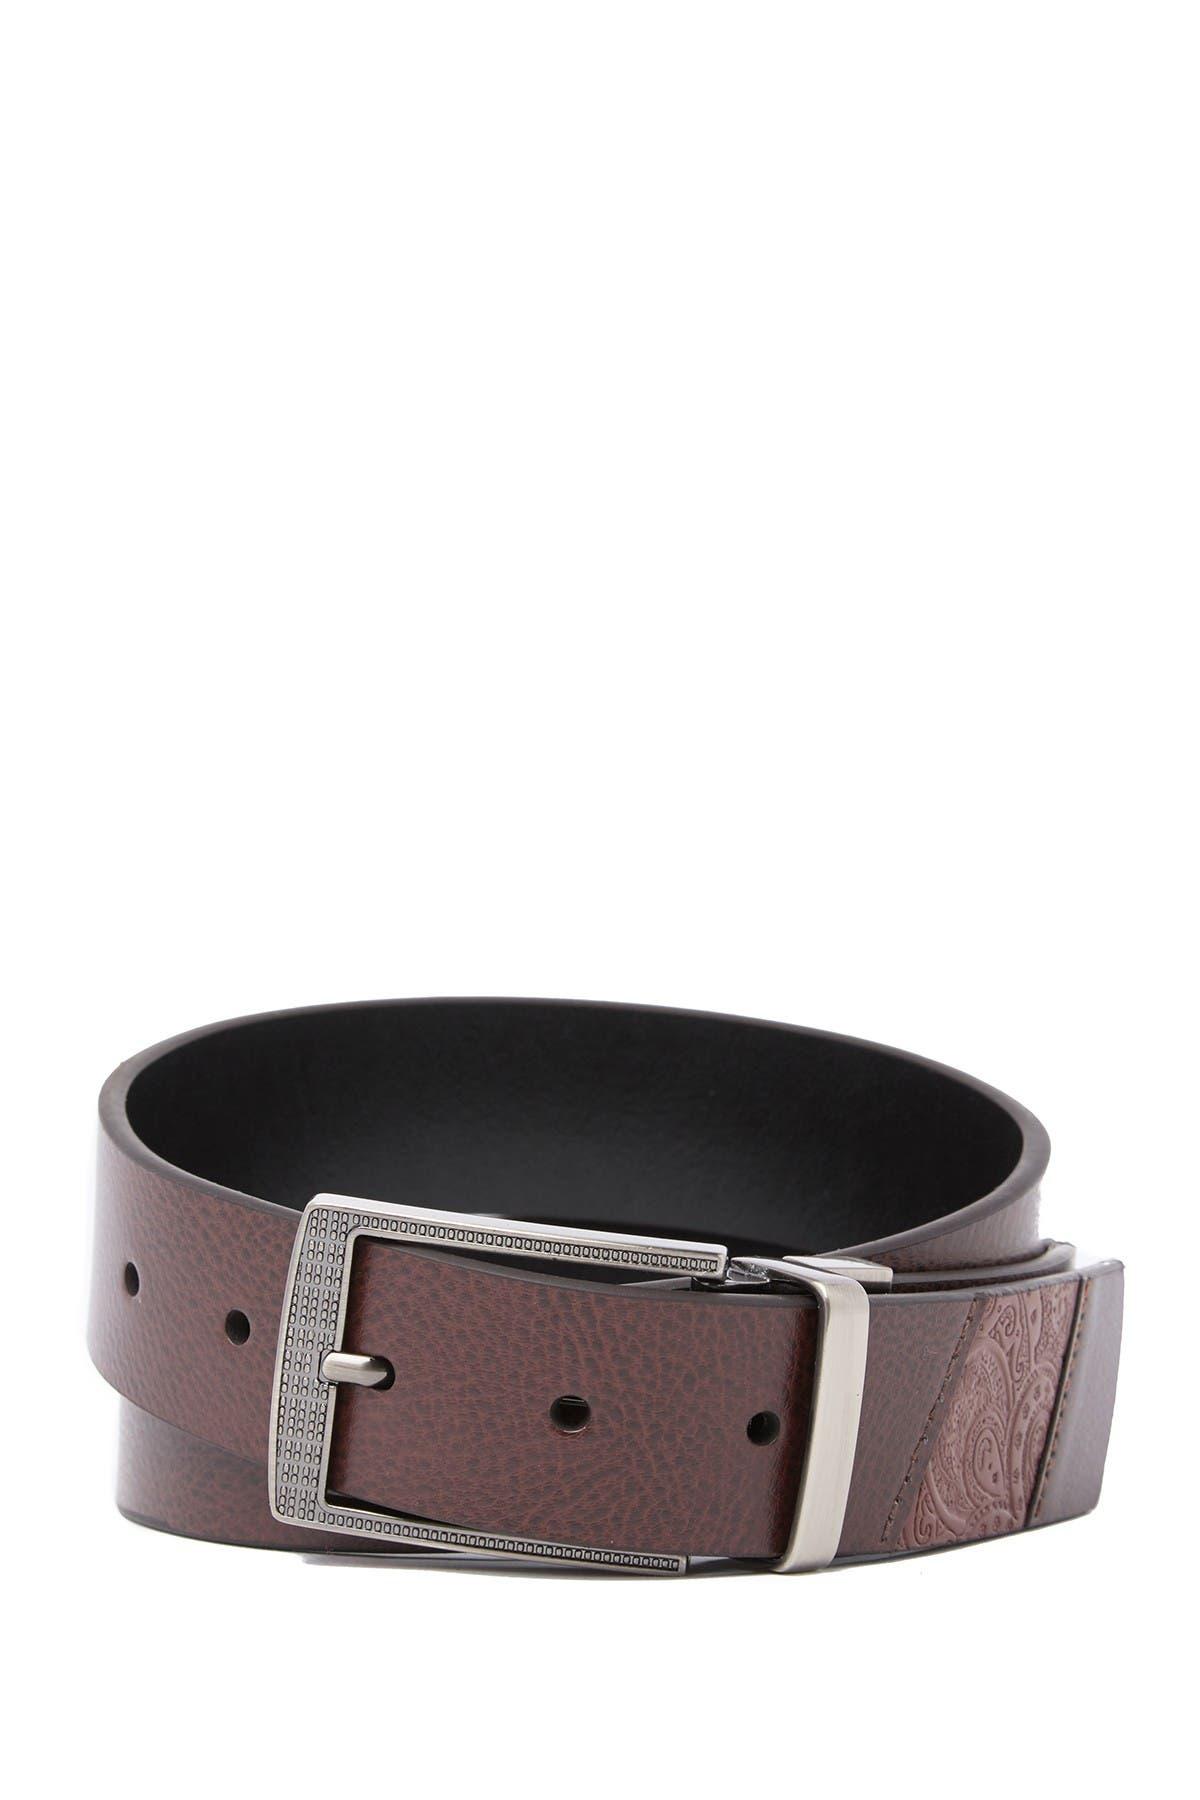 Image of Robert Graham Terdel Reversible Leather Belt